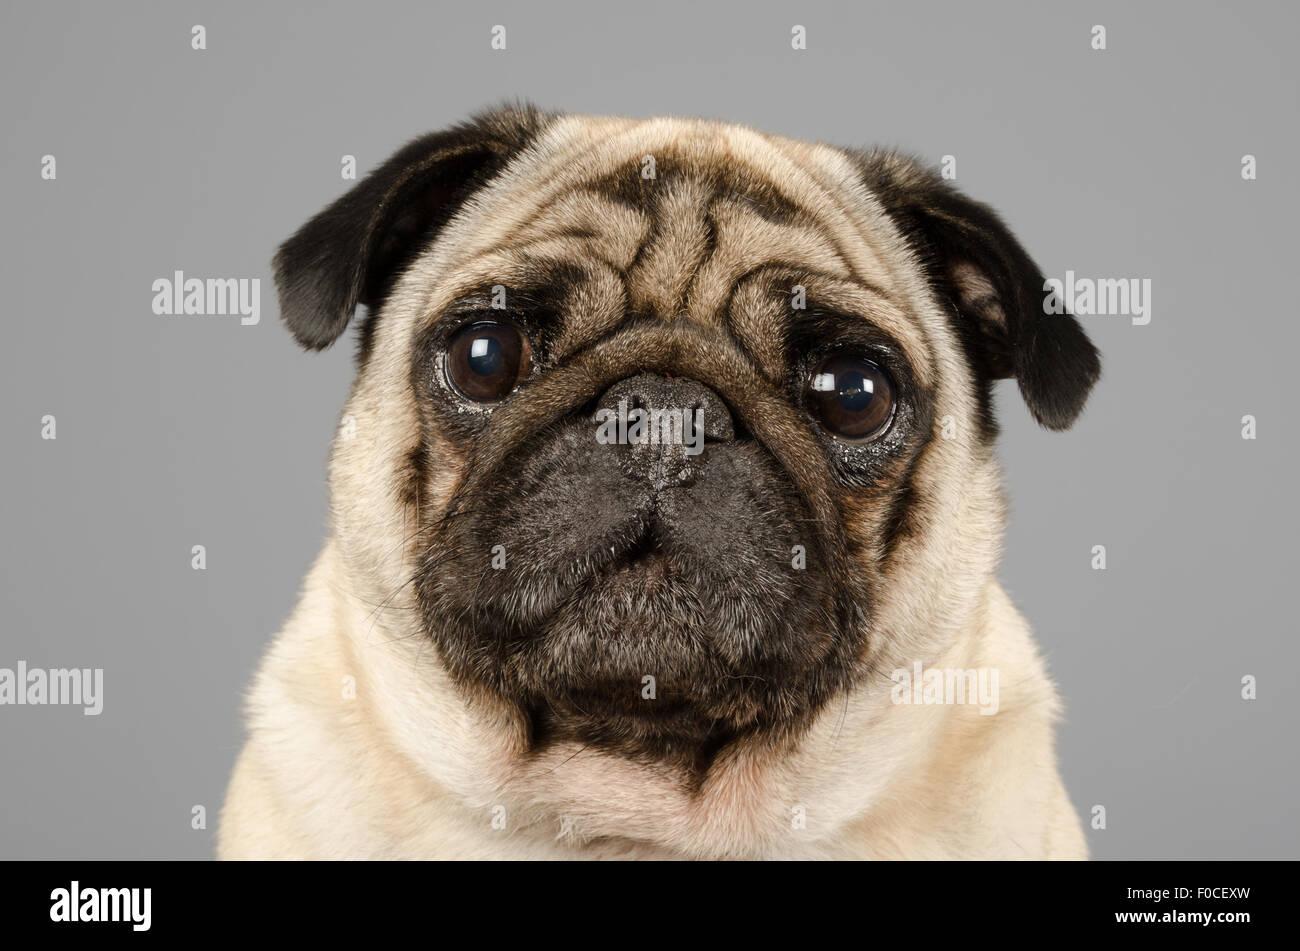 George the pug. - Stock Image